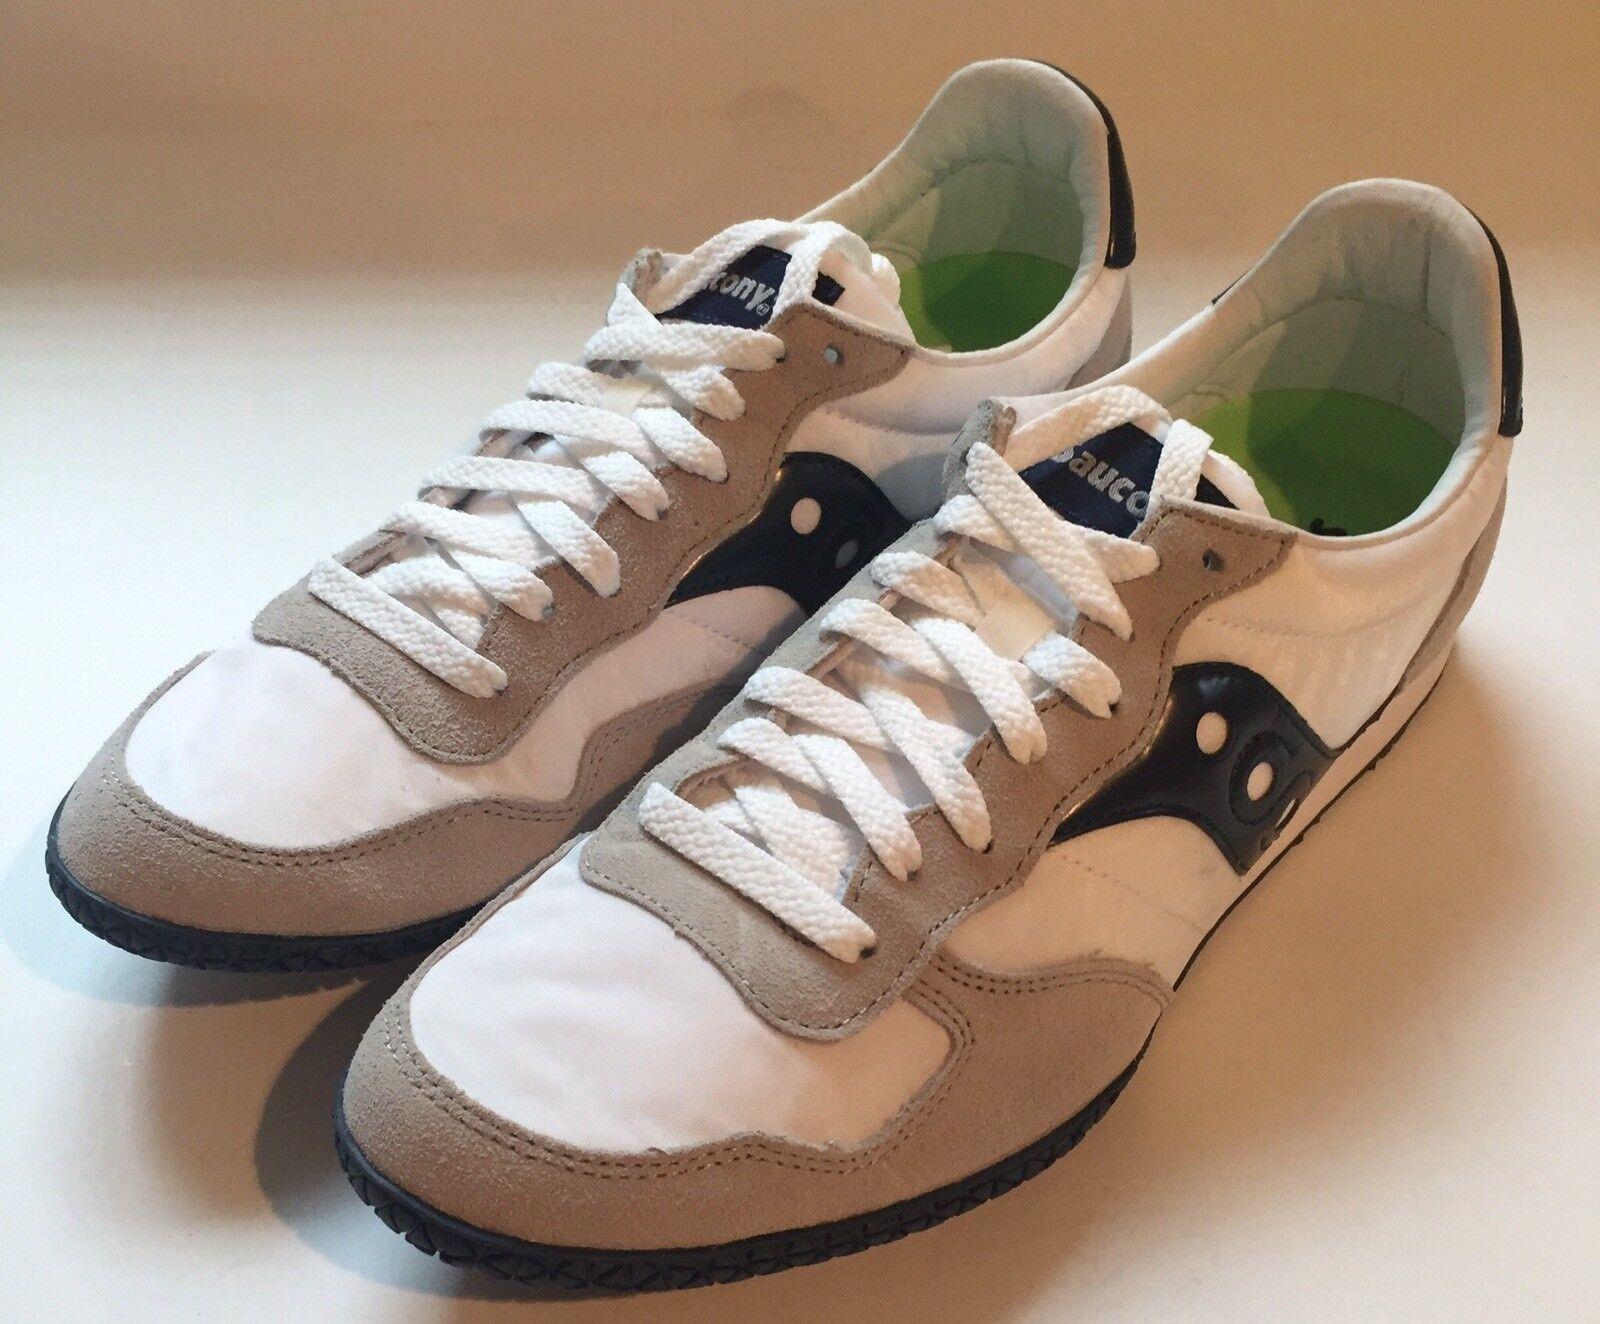 Saucony Bullet Men's Athletic shoes Size 10 White Navy Open Box 2943-38